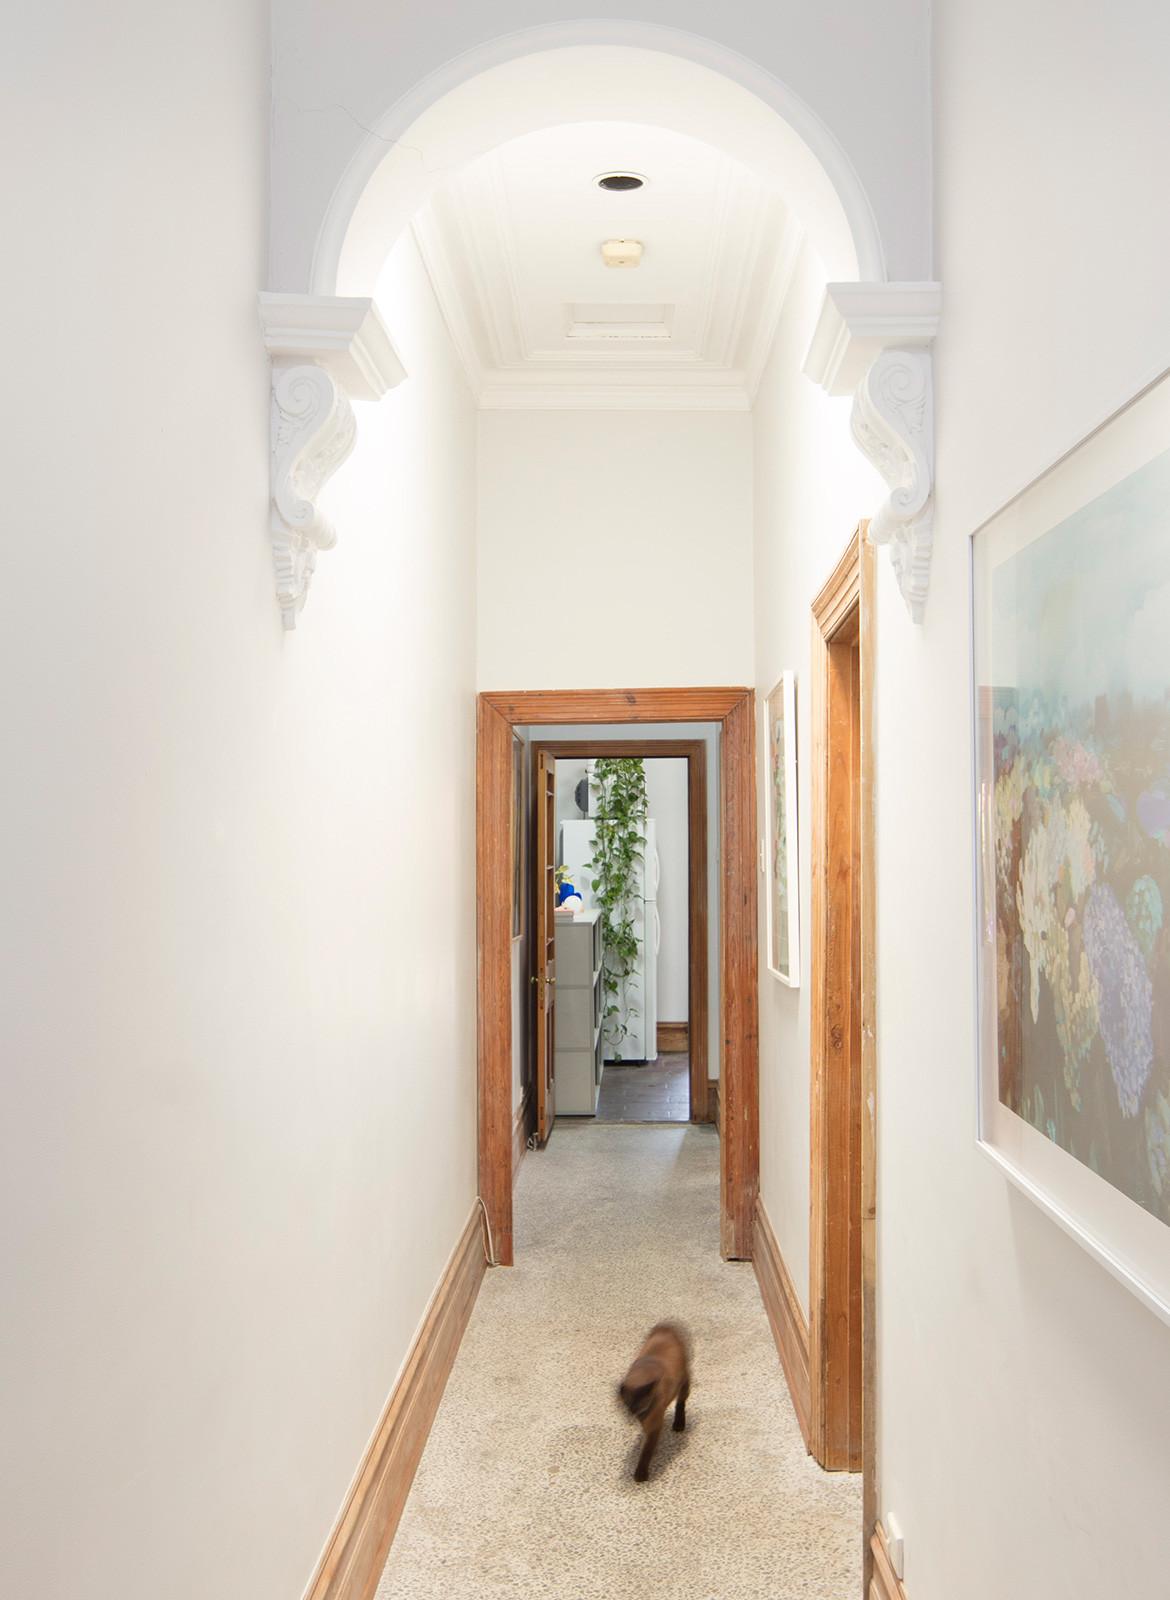 Anna Ross Kester Black CC Benjamin Hosking corridor